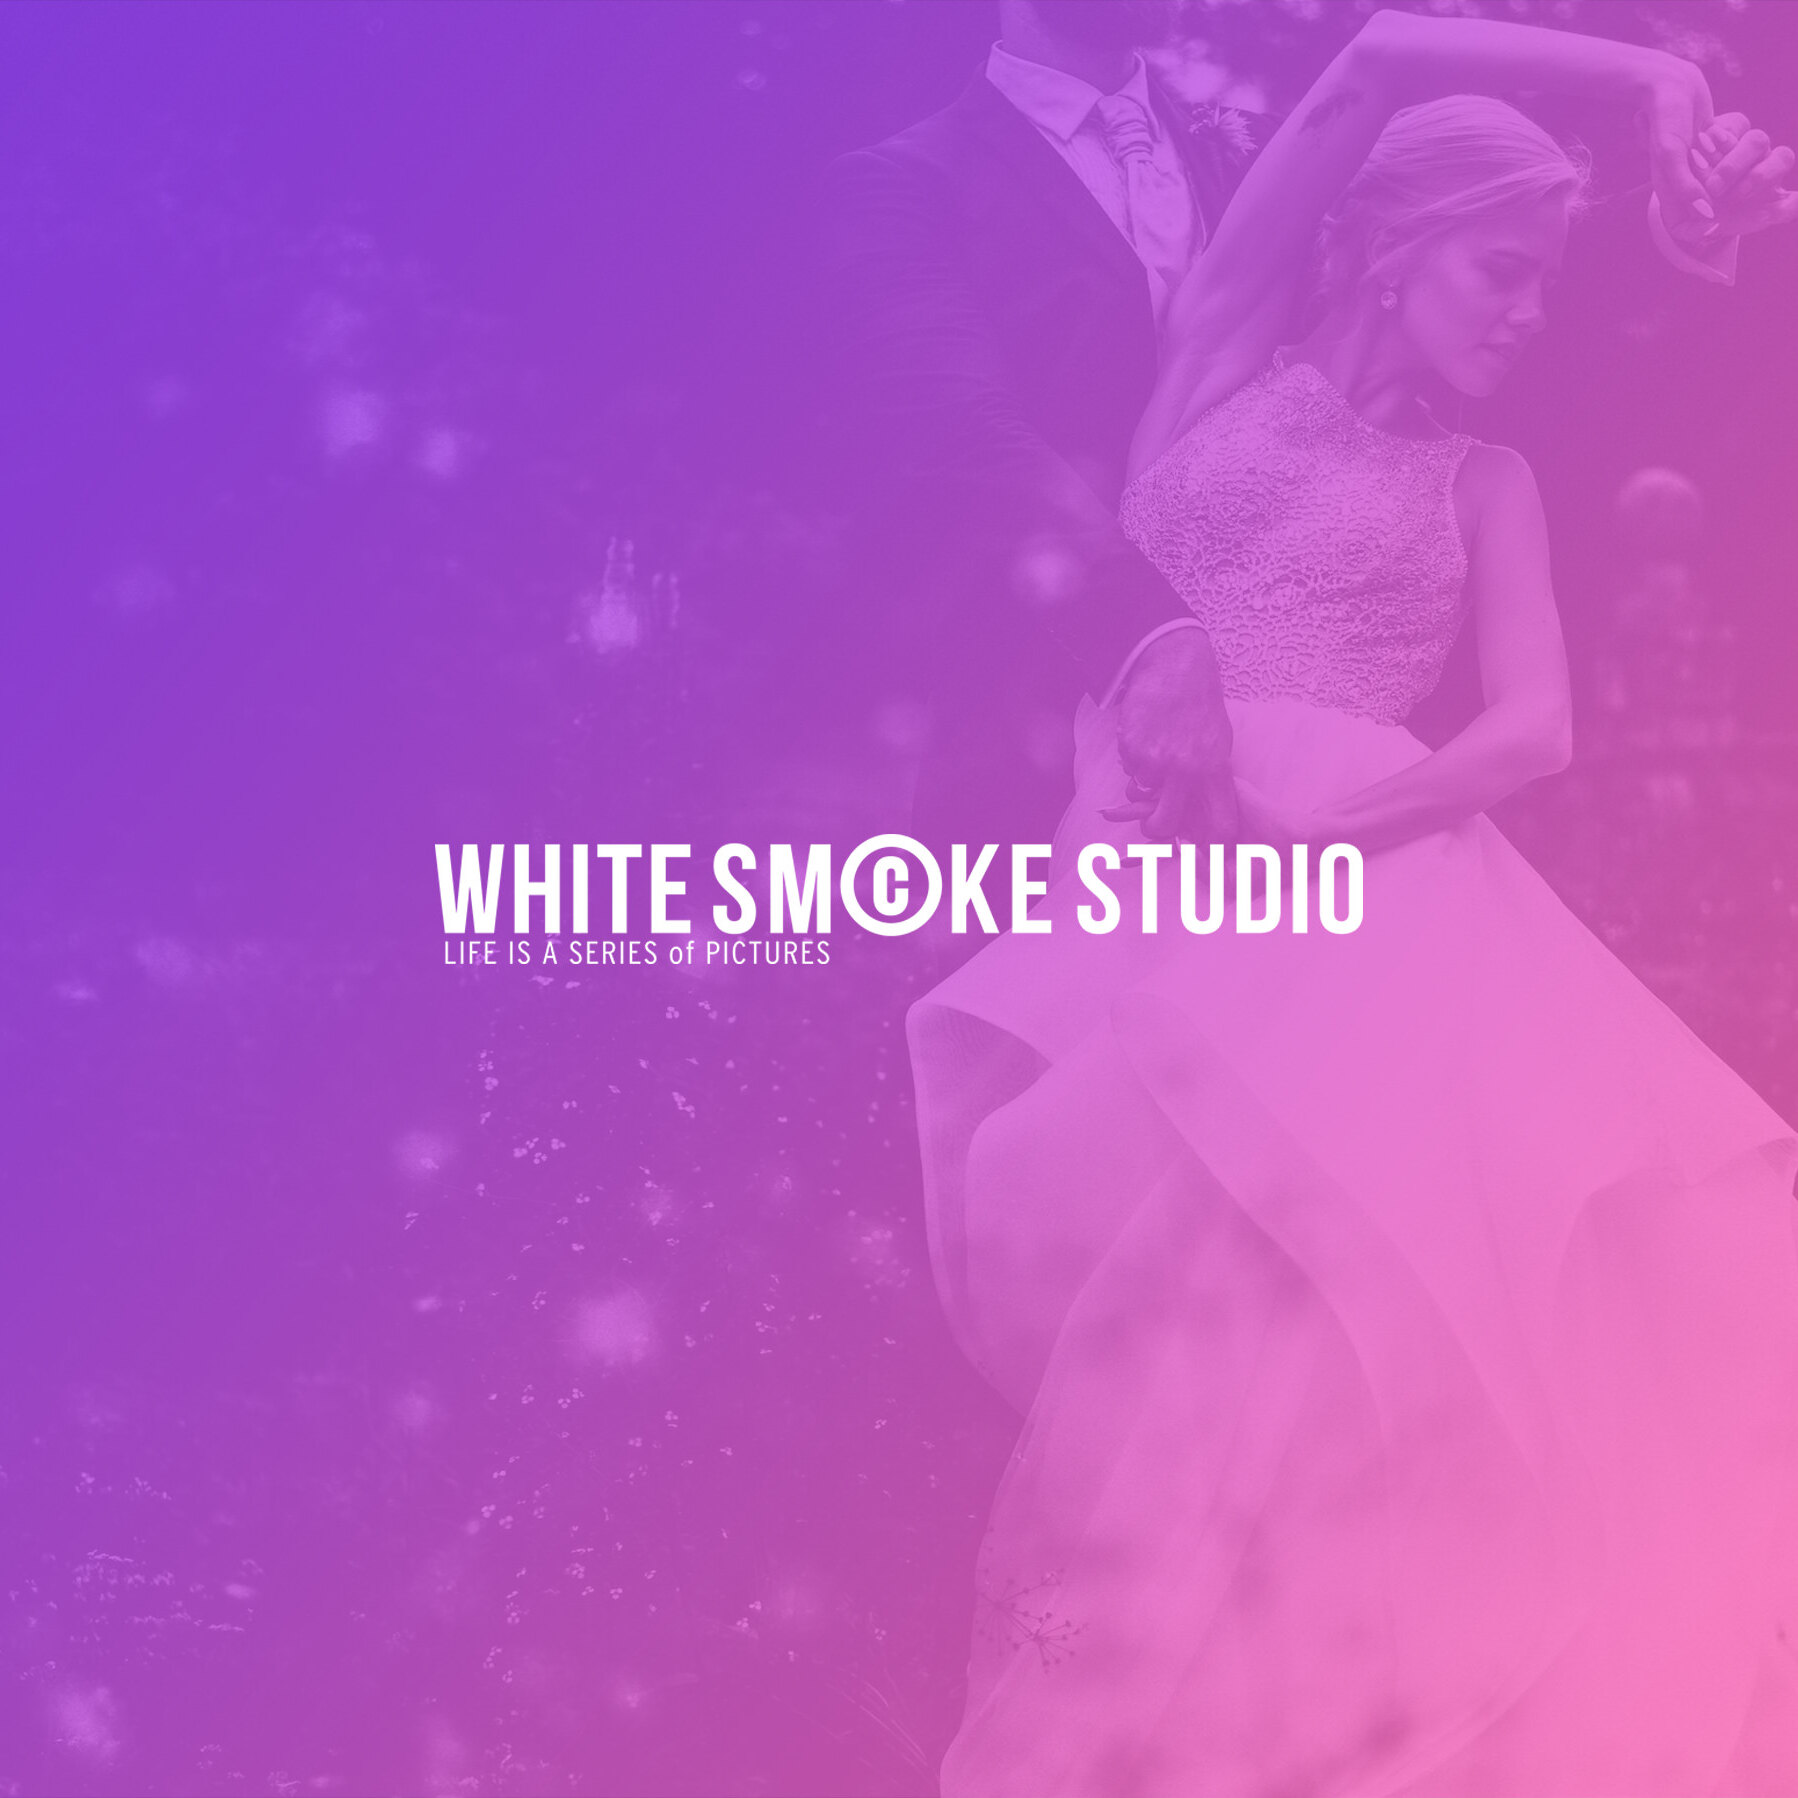 whitesmokestudio uai